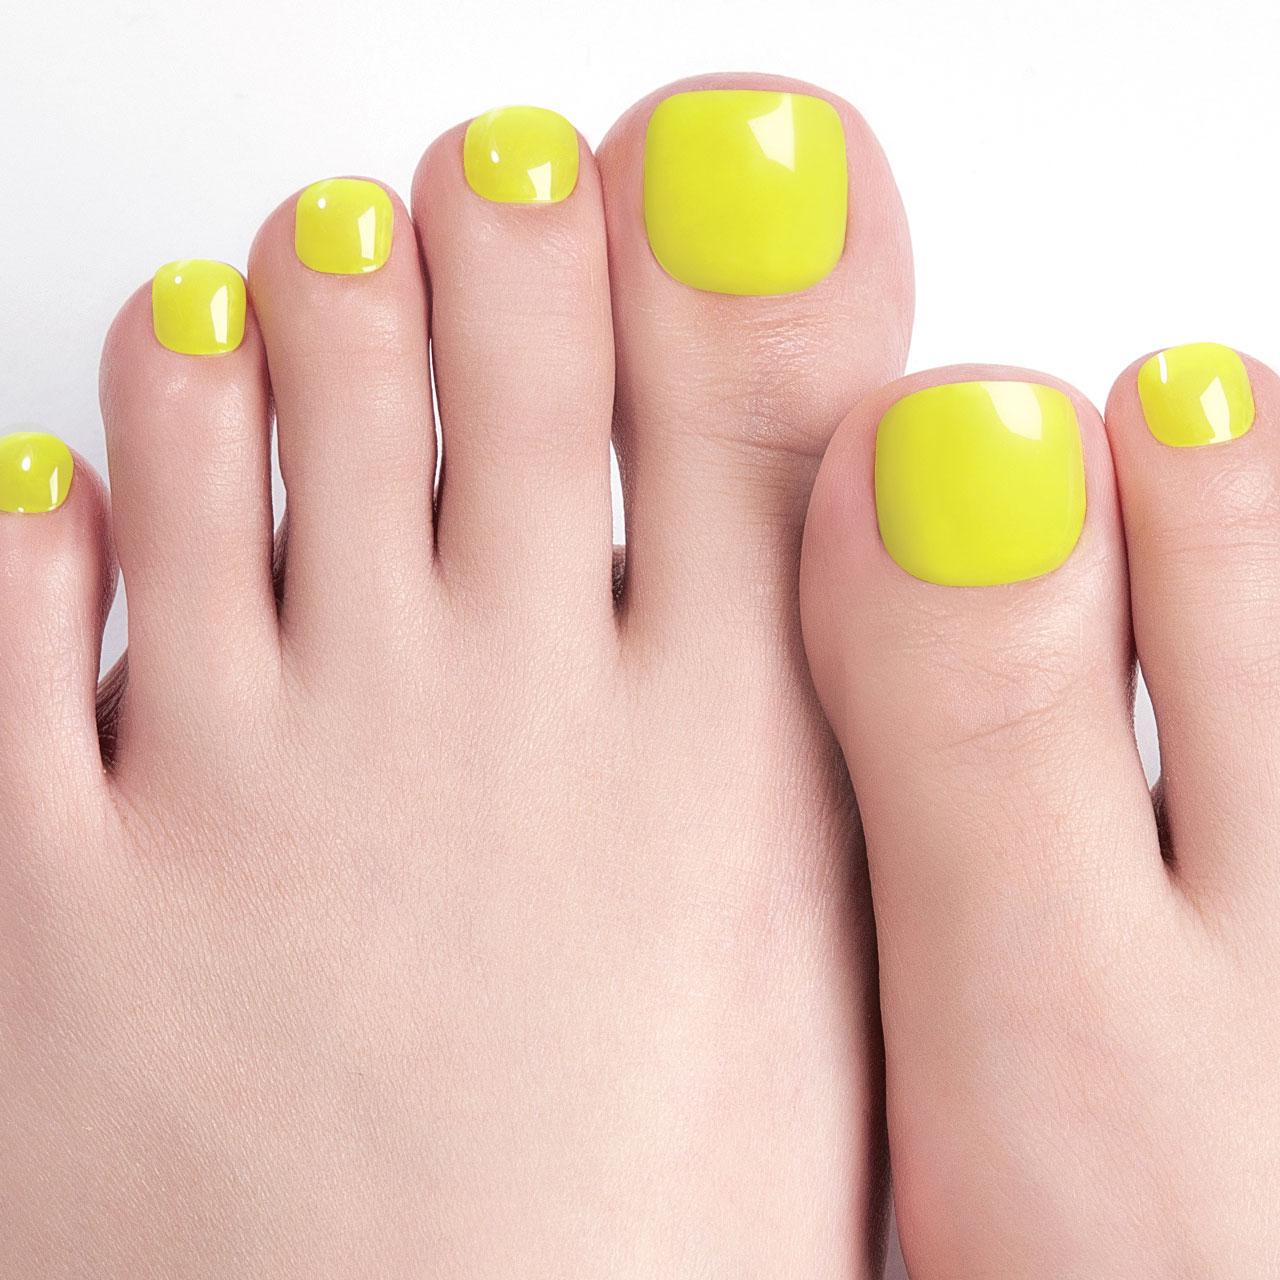 【Juicy Lemon Pedi】ダッシングディバグレーズ ペディ